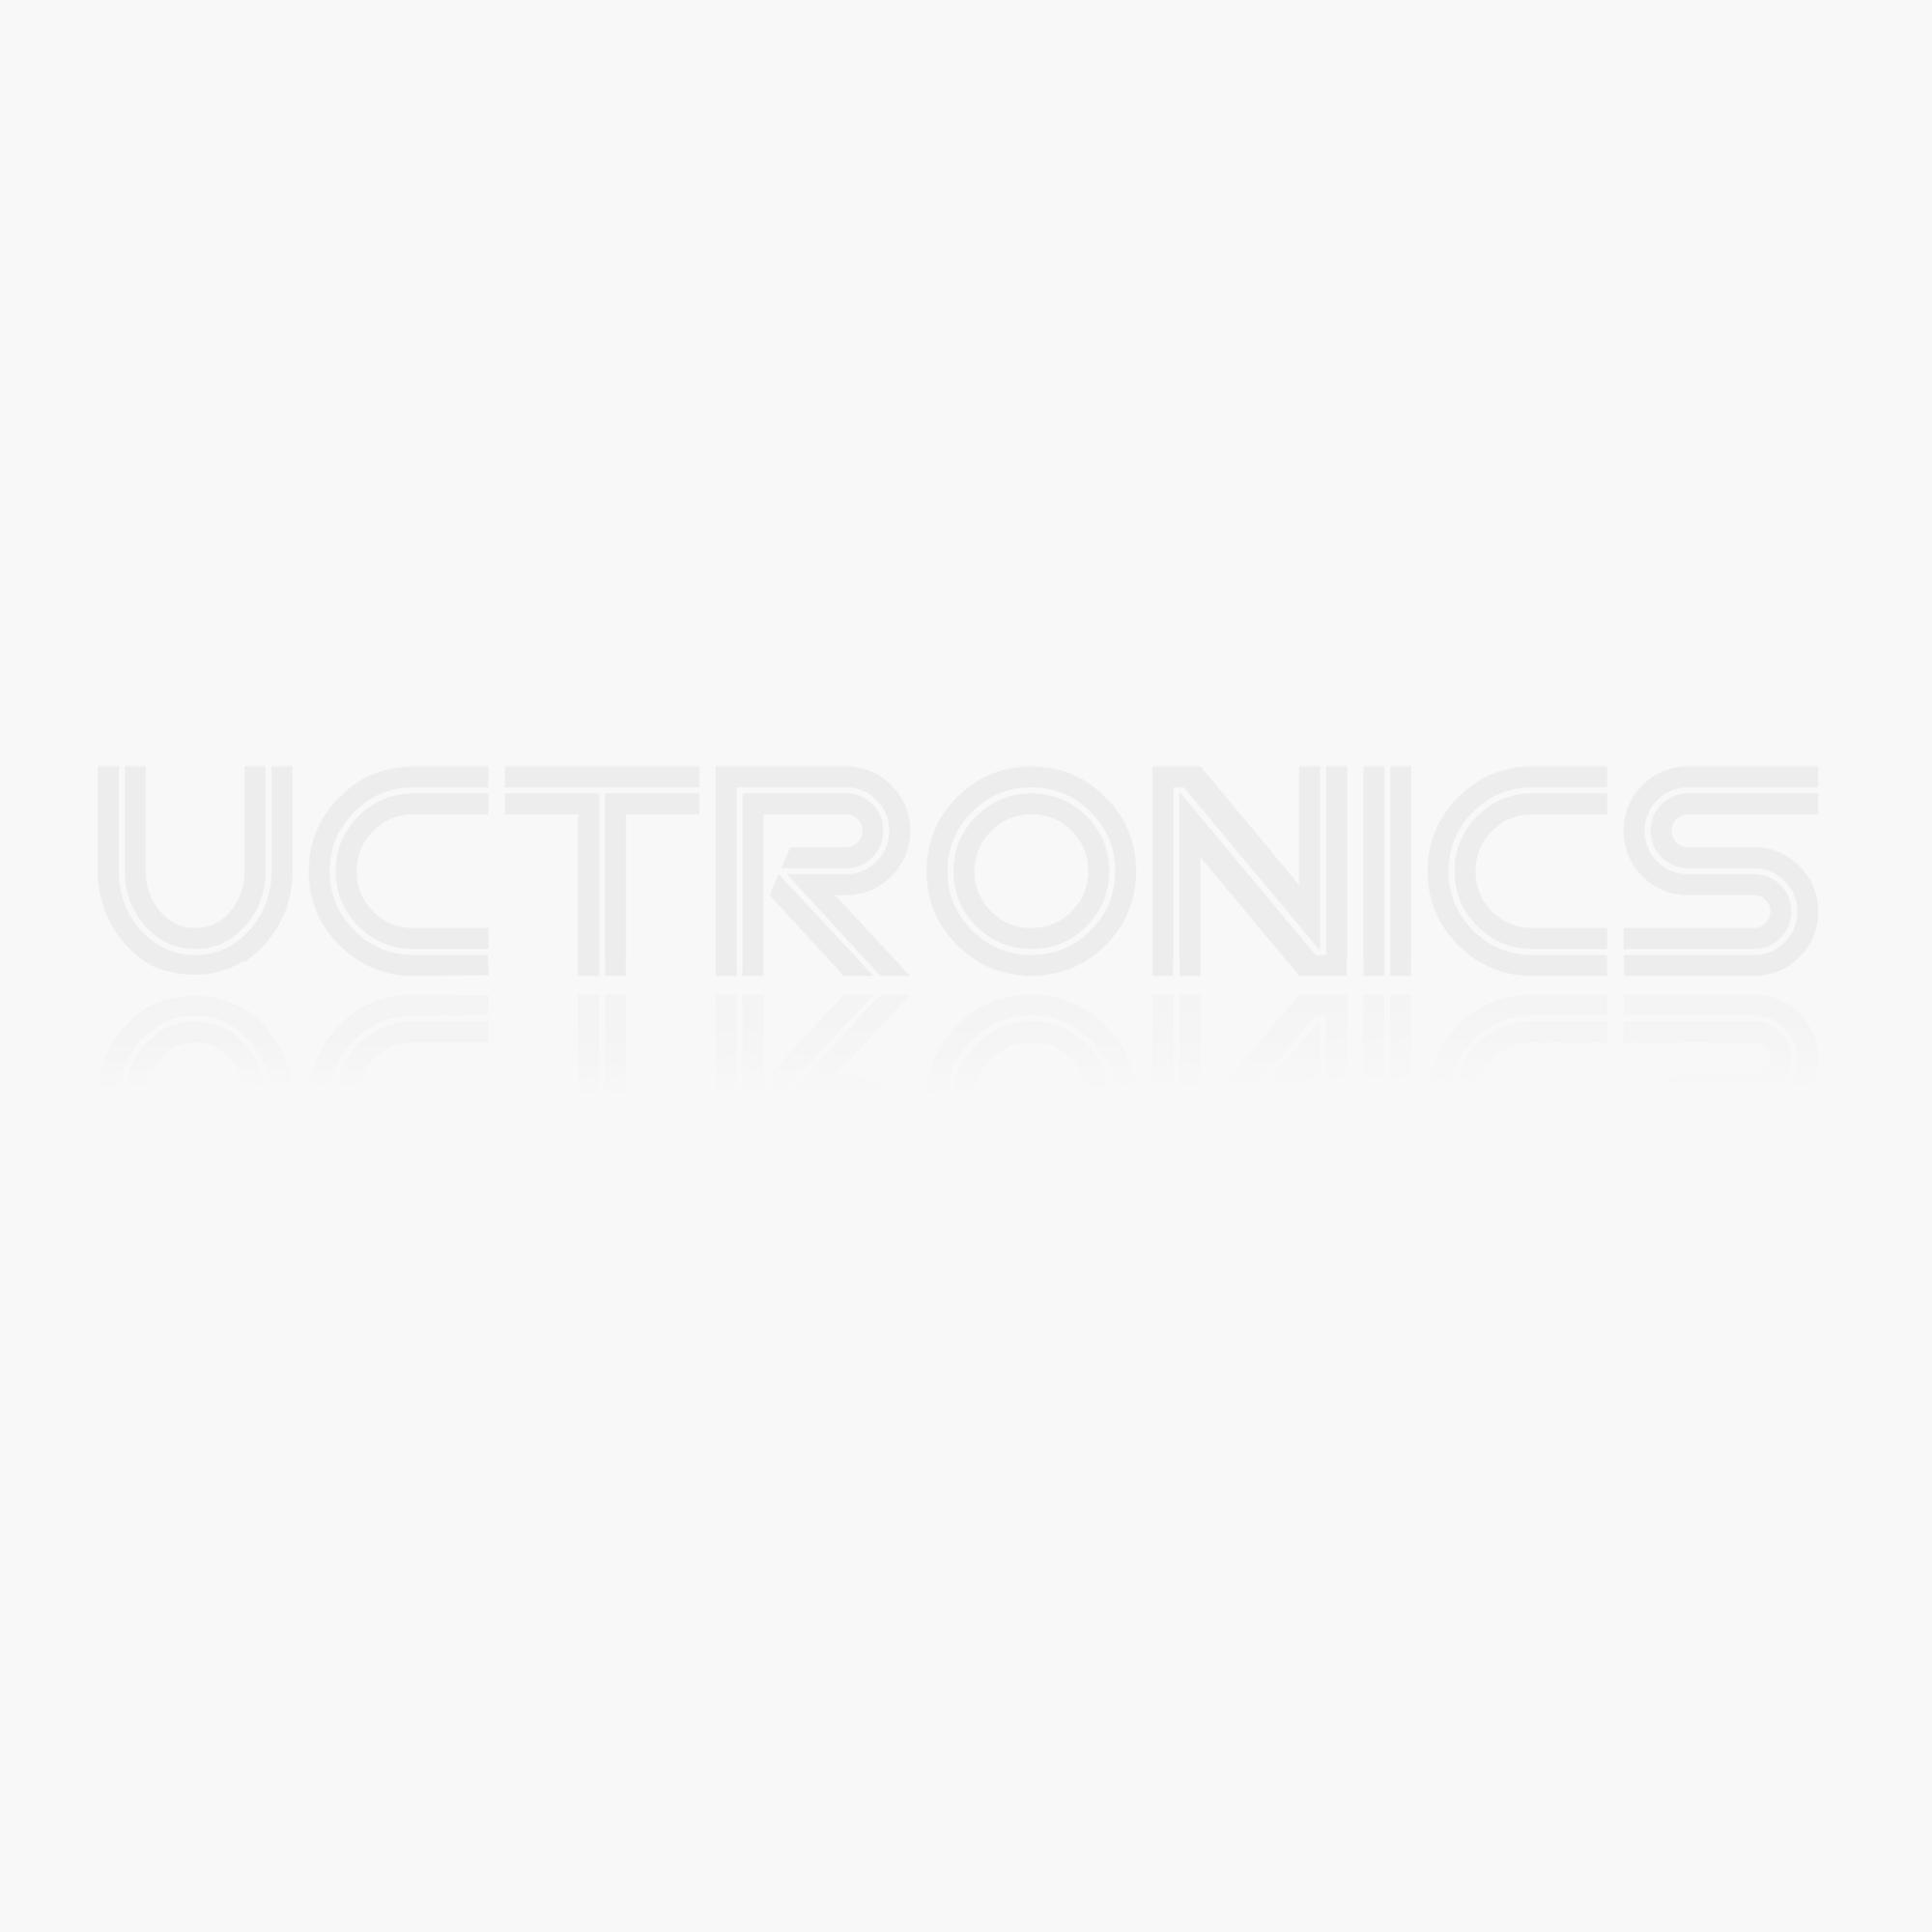 Photosensitive Resistor Module Automatic Brightness DC 12V Relay Control Switch